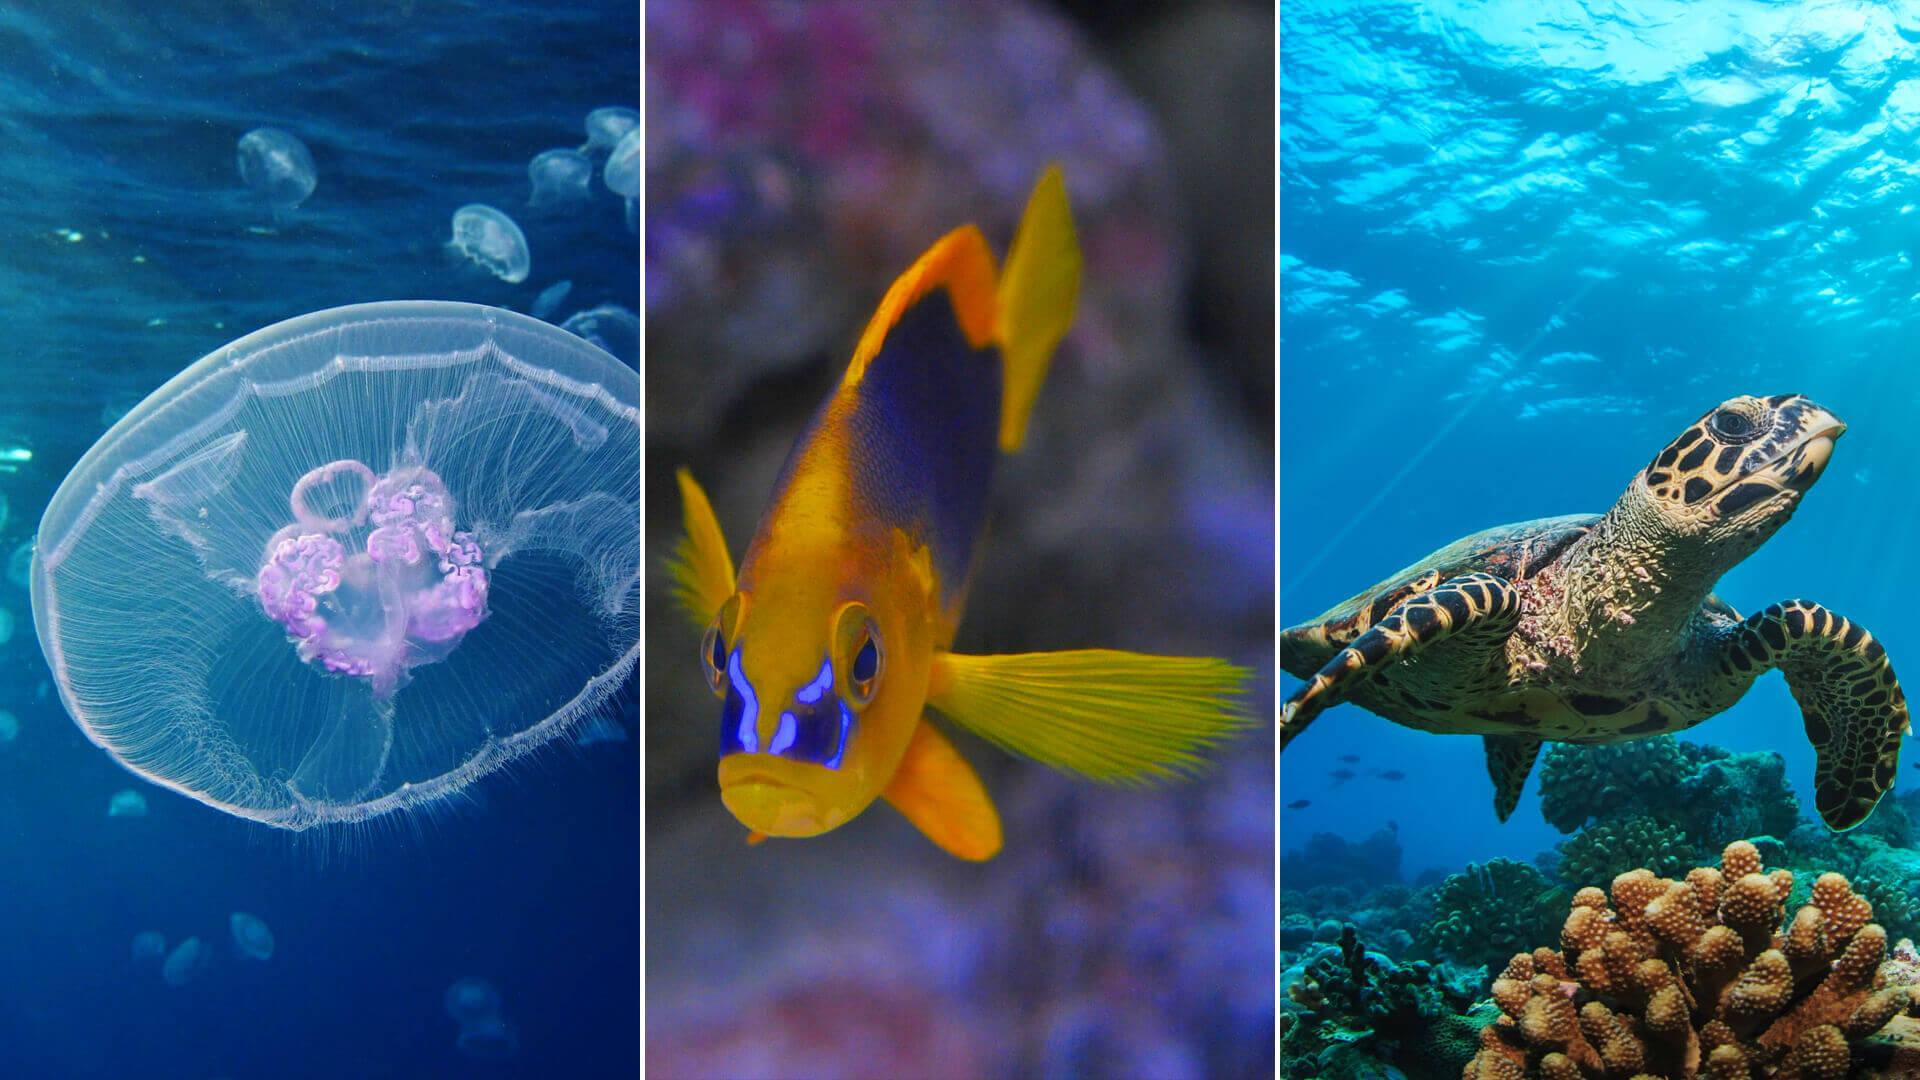 3 types of aquatic animals kids could see at the key west aquarium